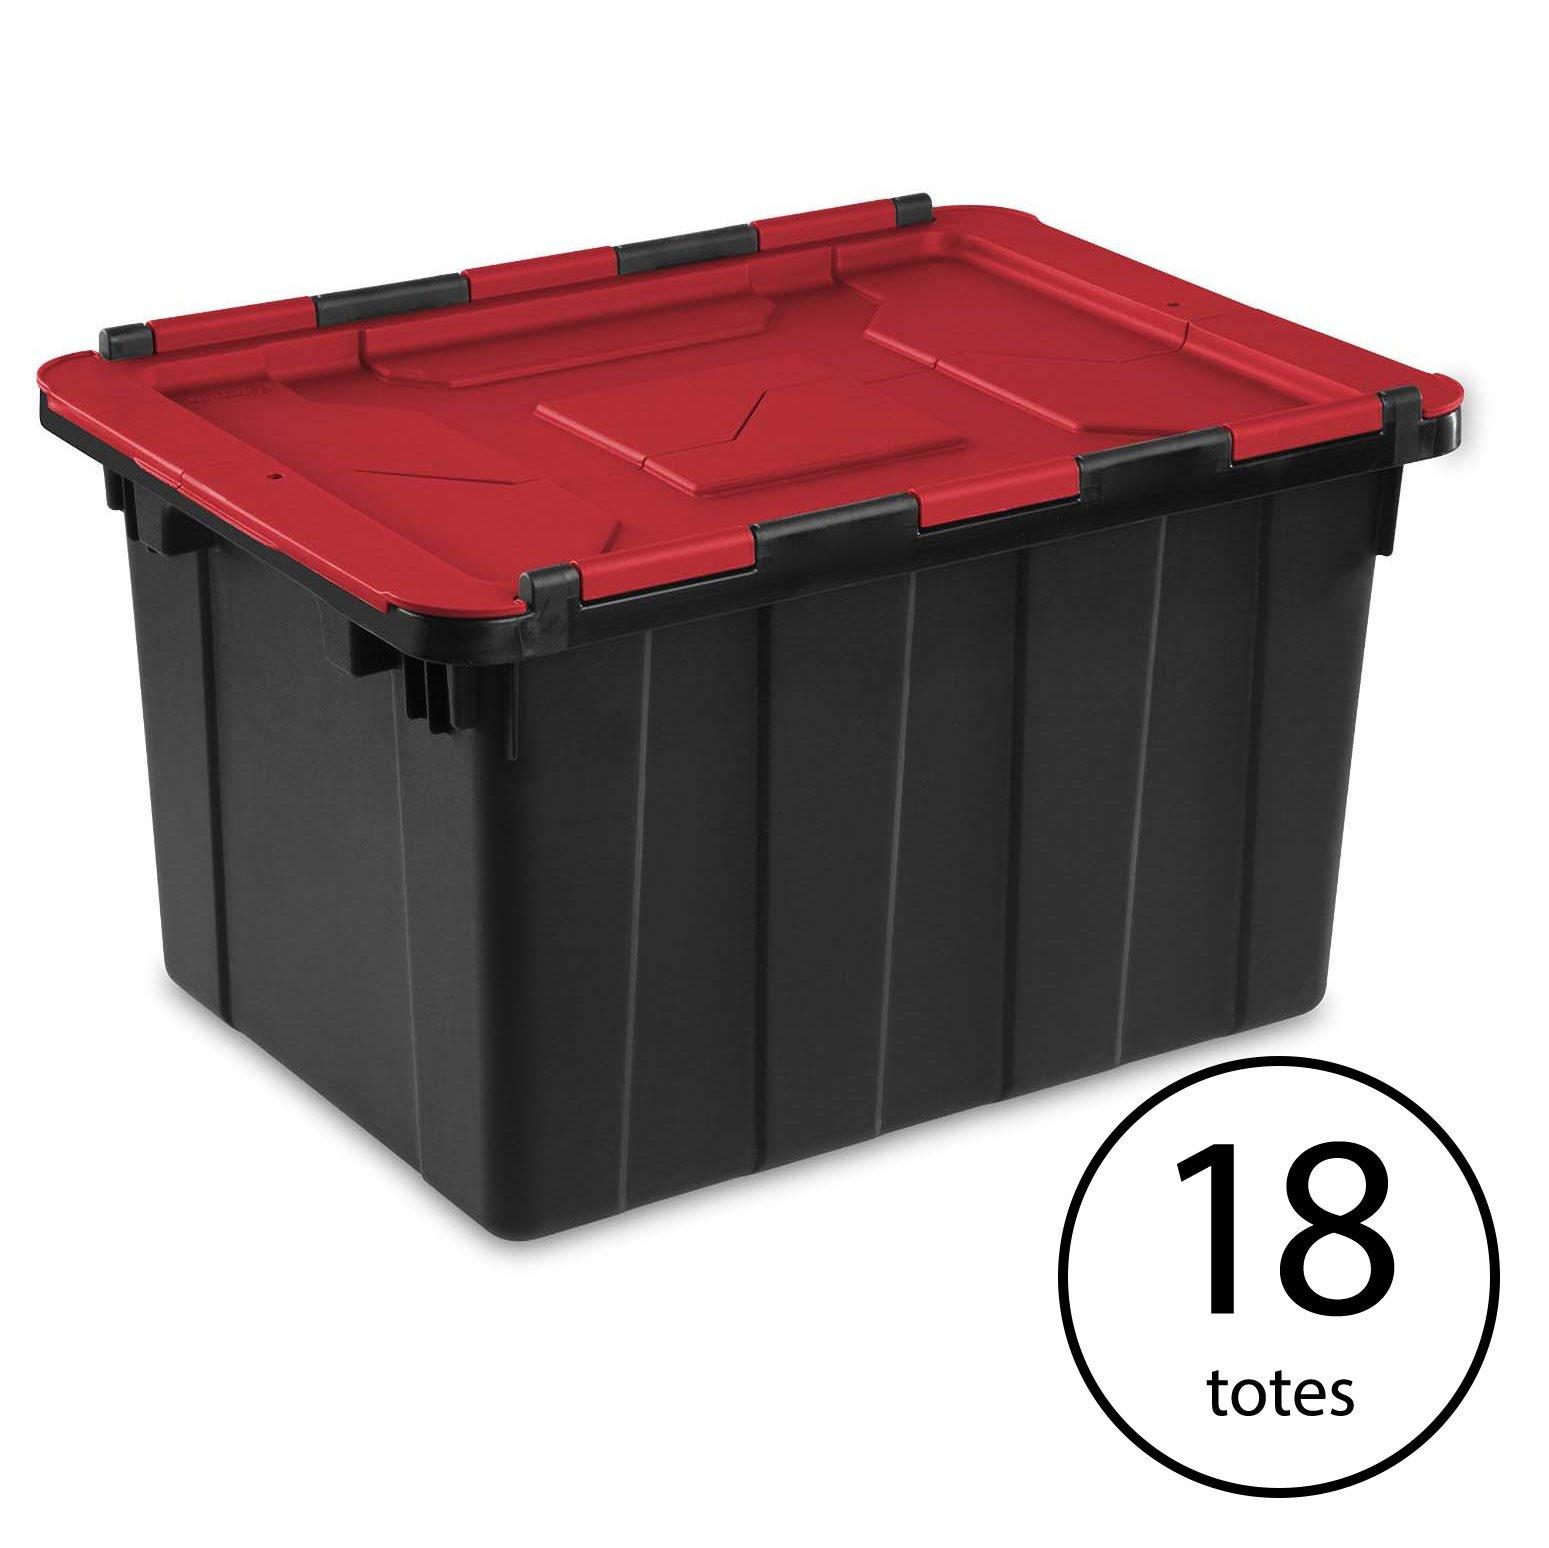 Sterilite 12 Gallon/45 Liter Hinged Lid Industrial Tote, Red Lid (18 Pack)